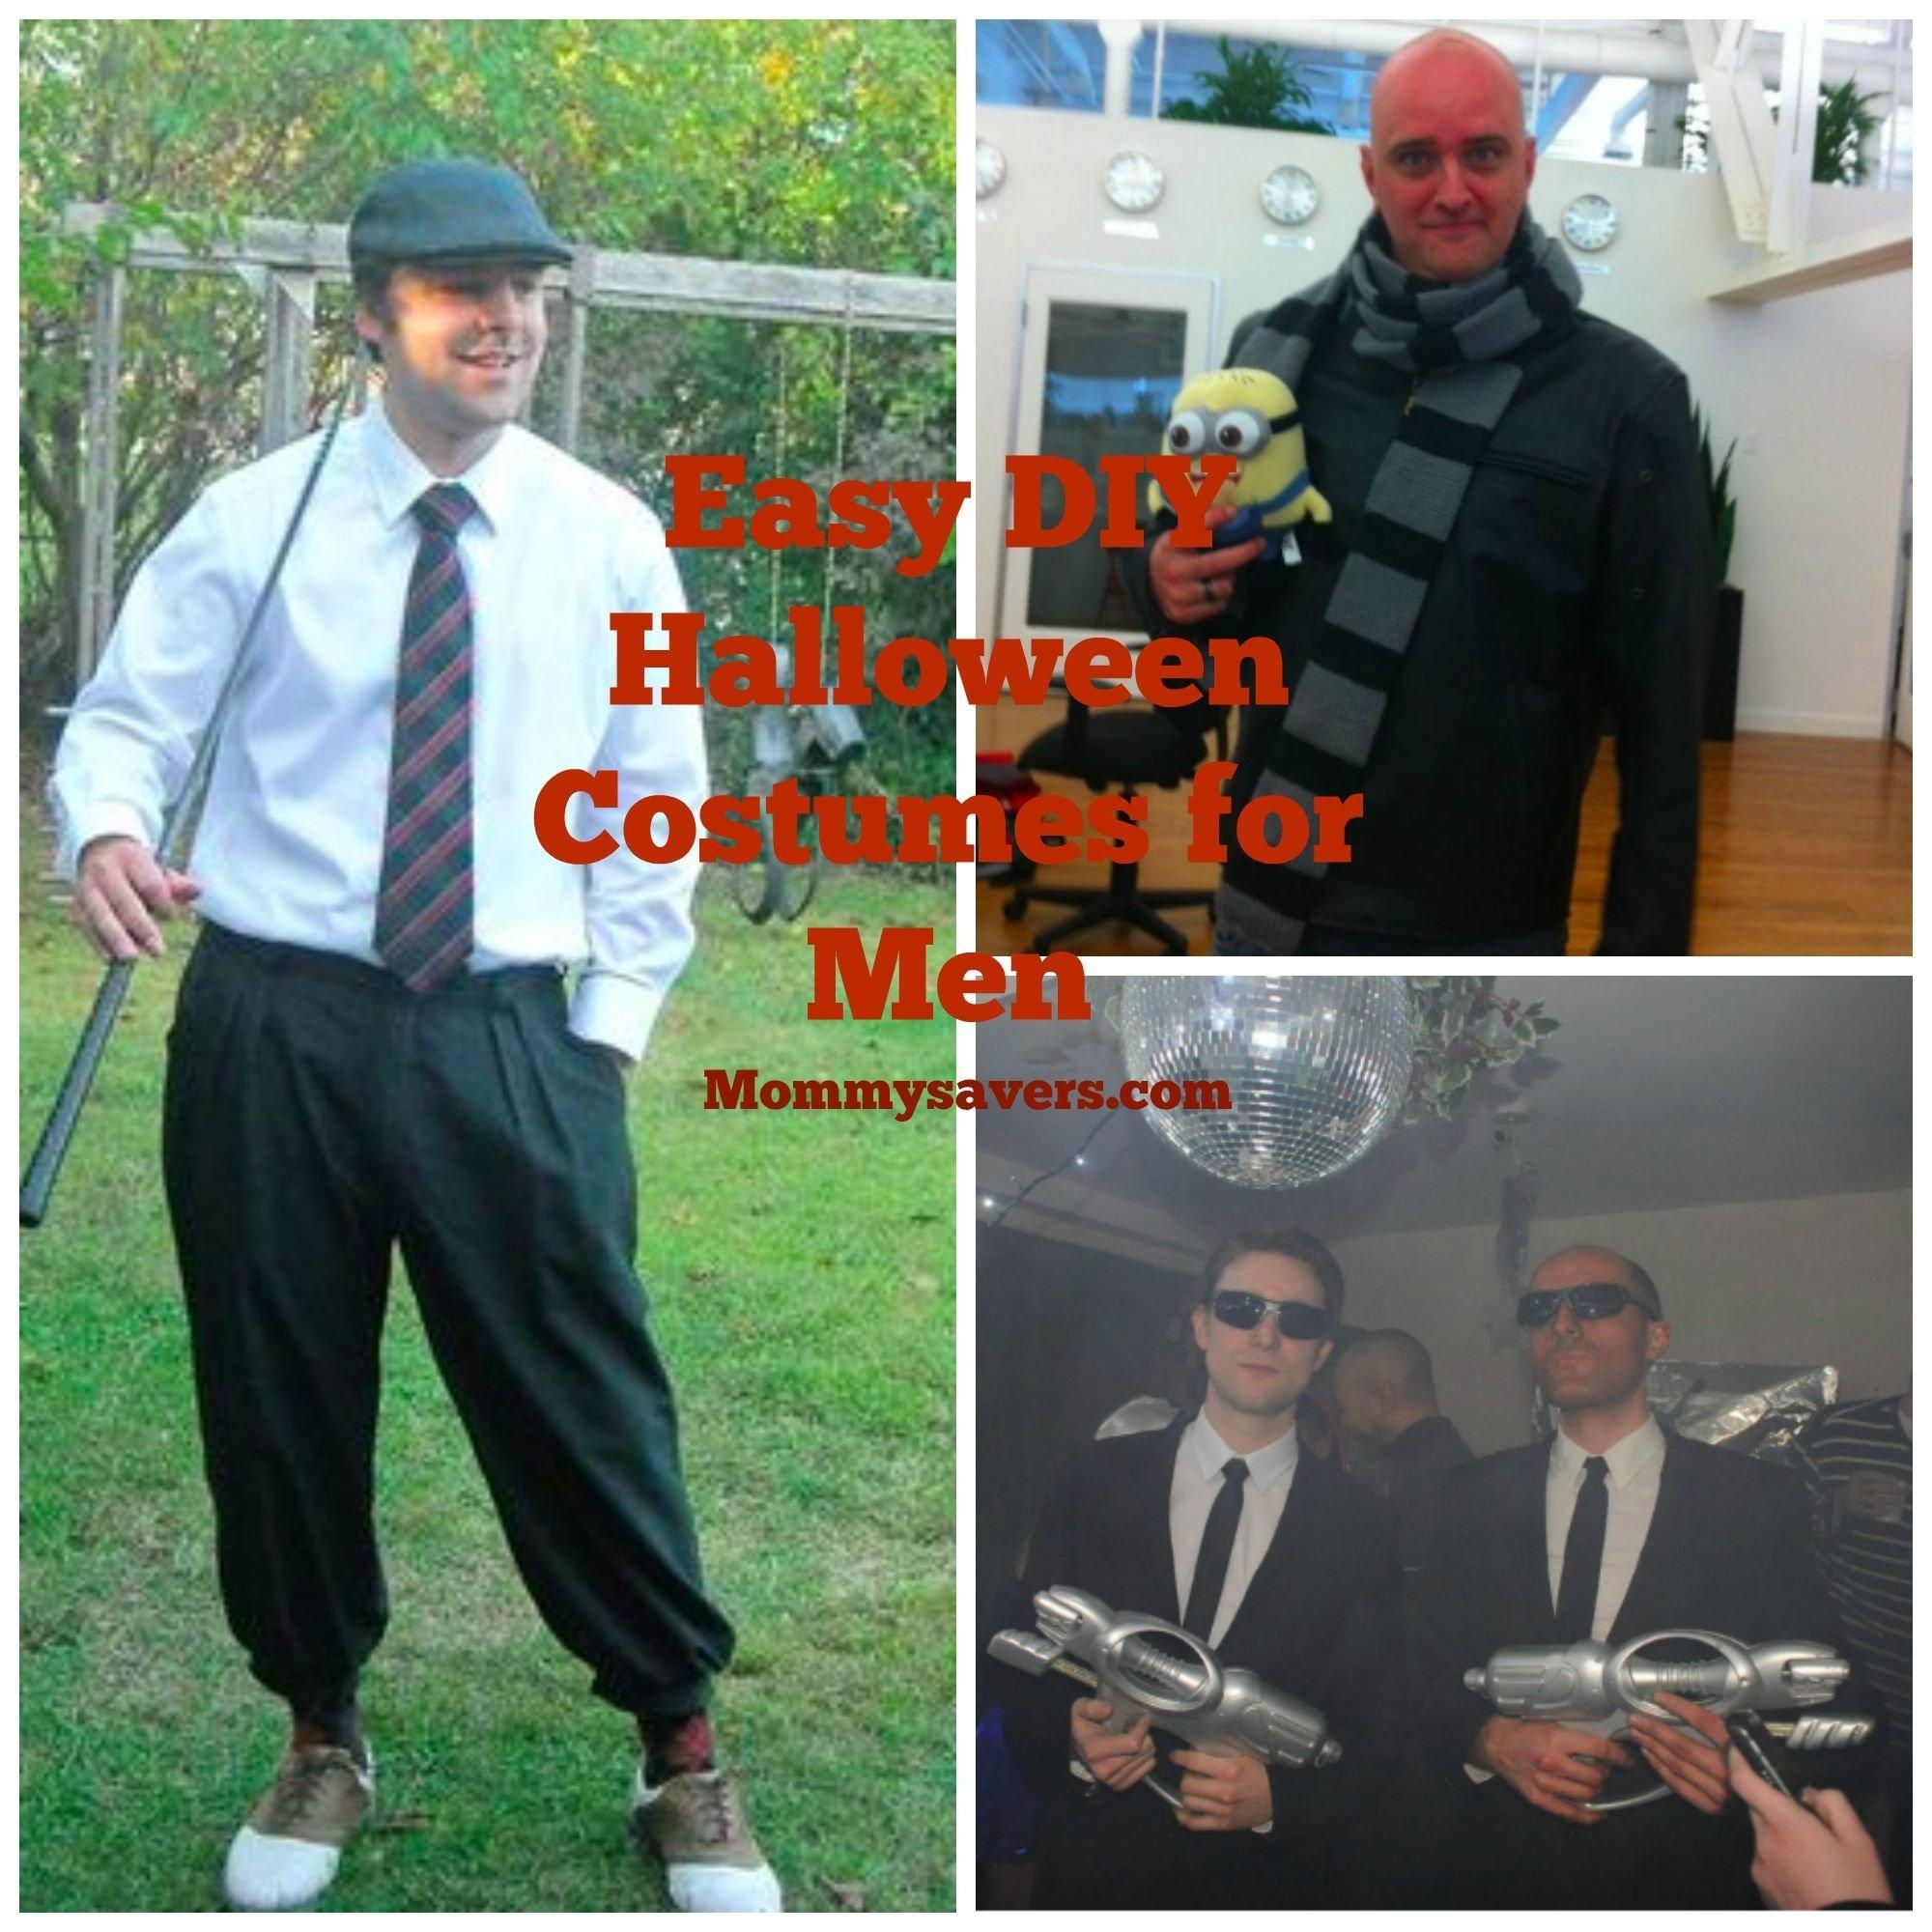 10 Fabulous Homemade Halloween Costume Ideas For Men diy halloween costumes for men mommysavers 2 2020